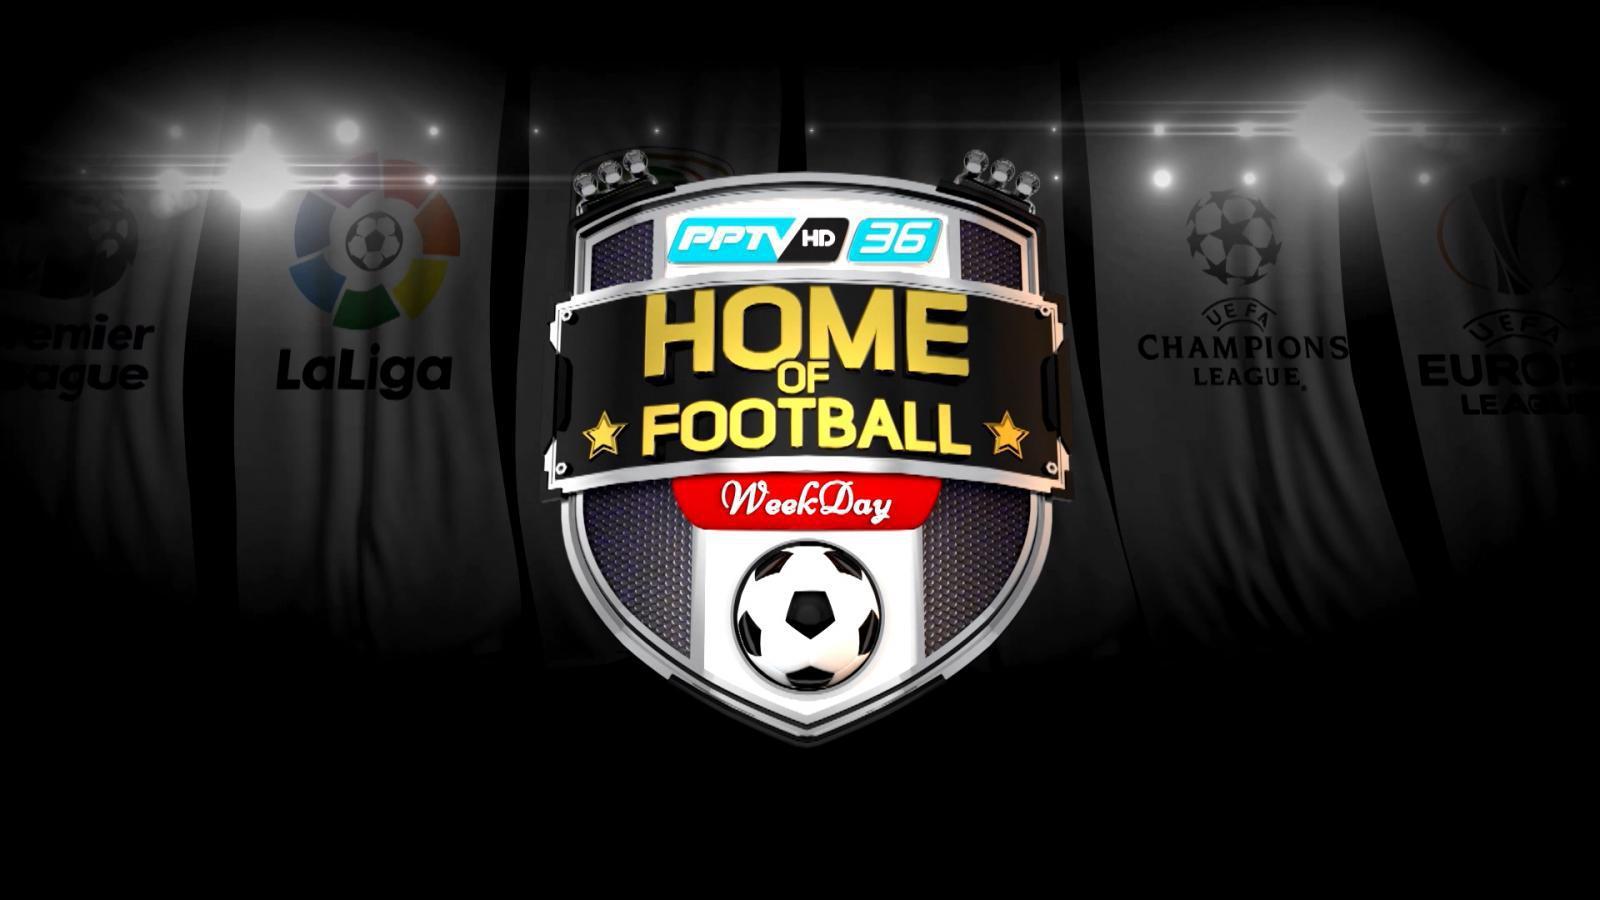 Home of Football Weekday